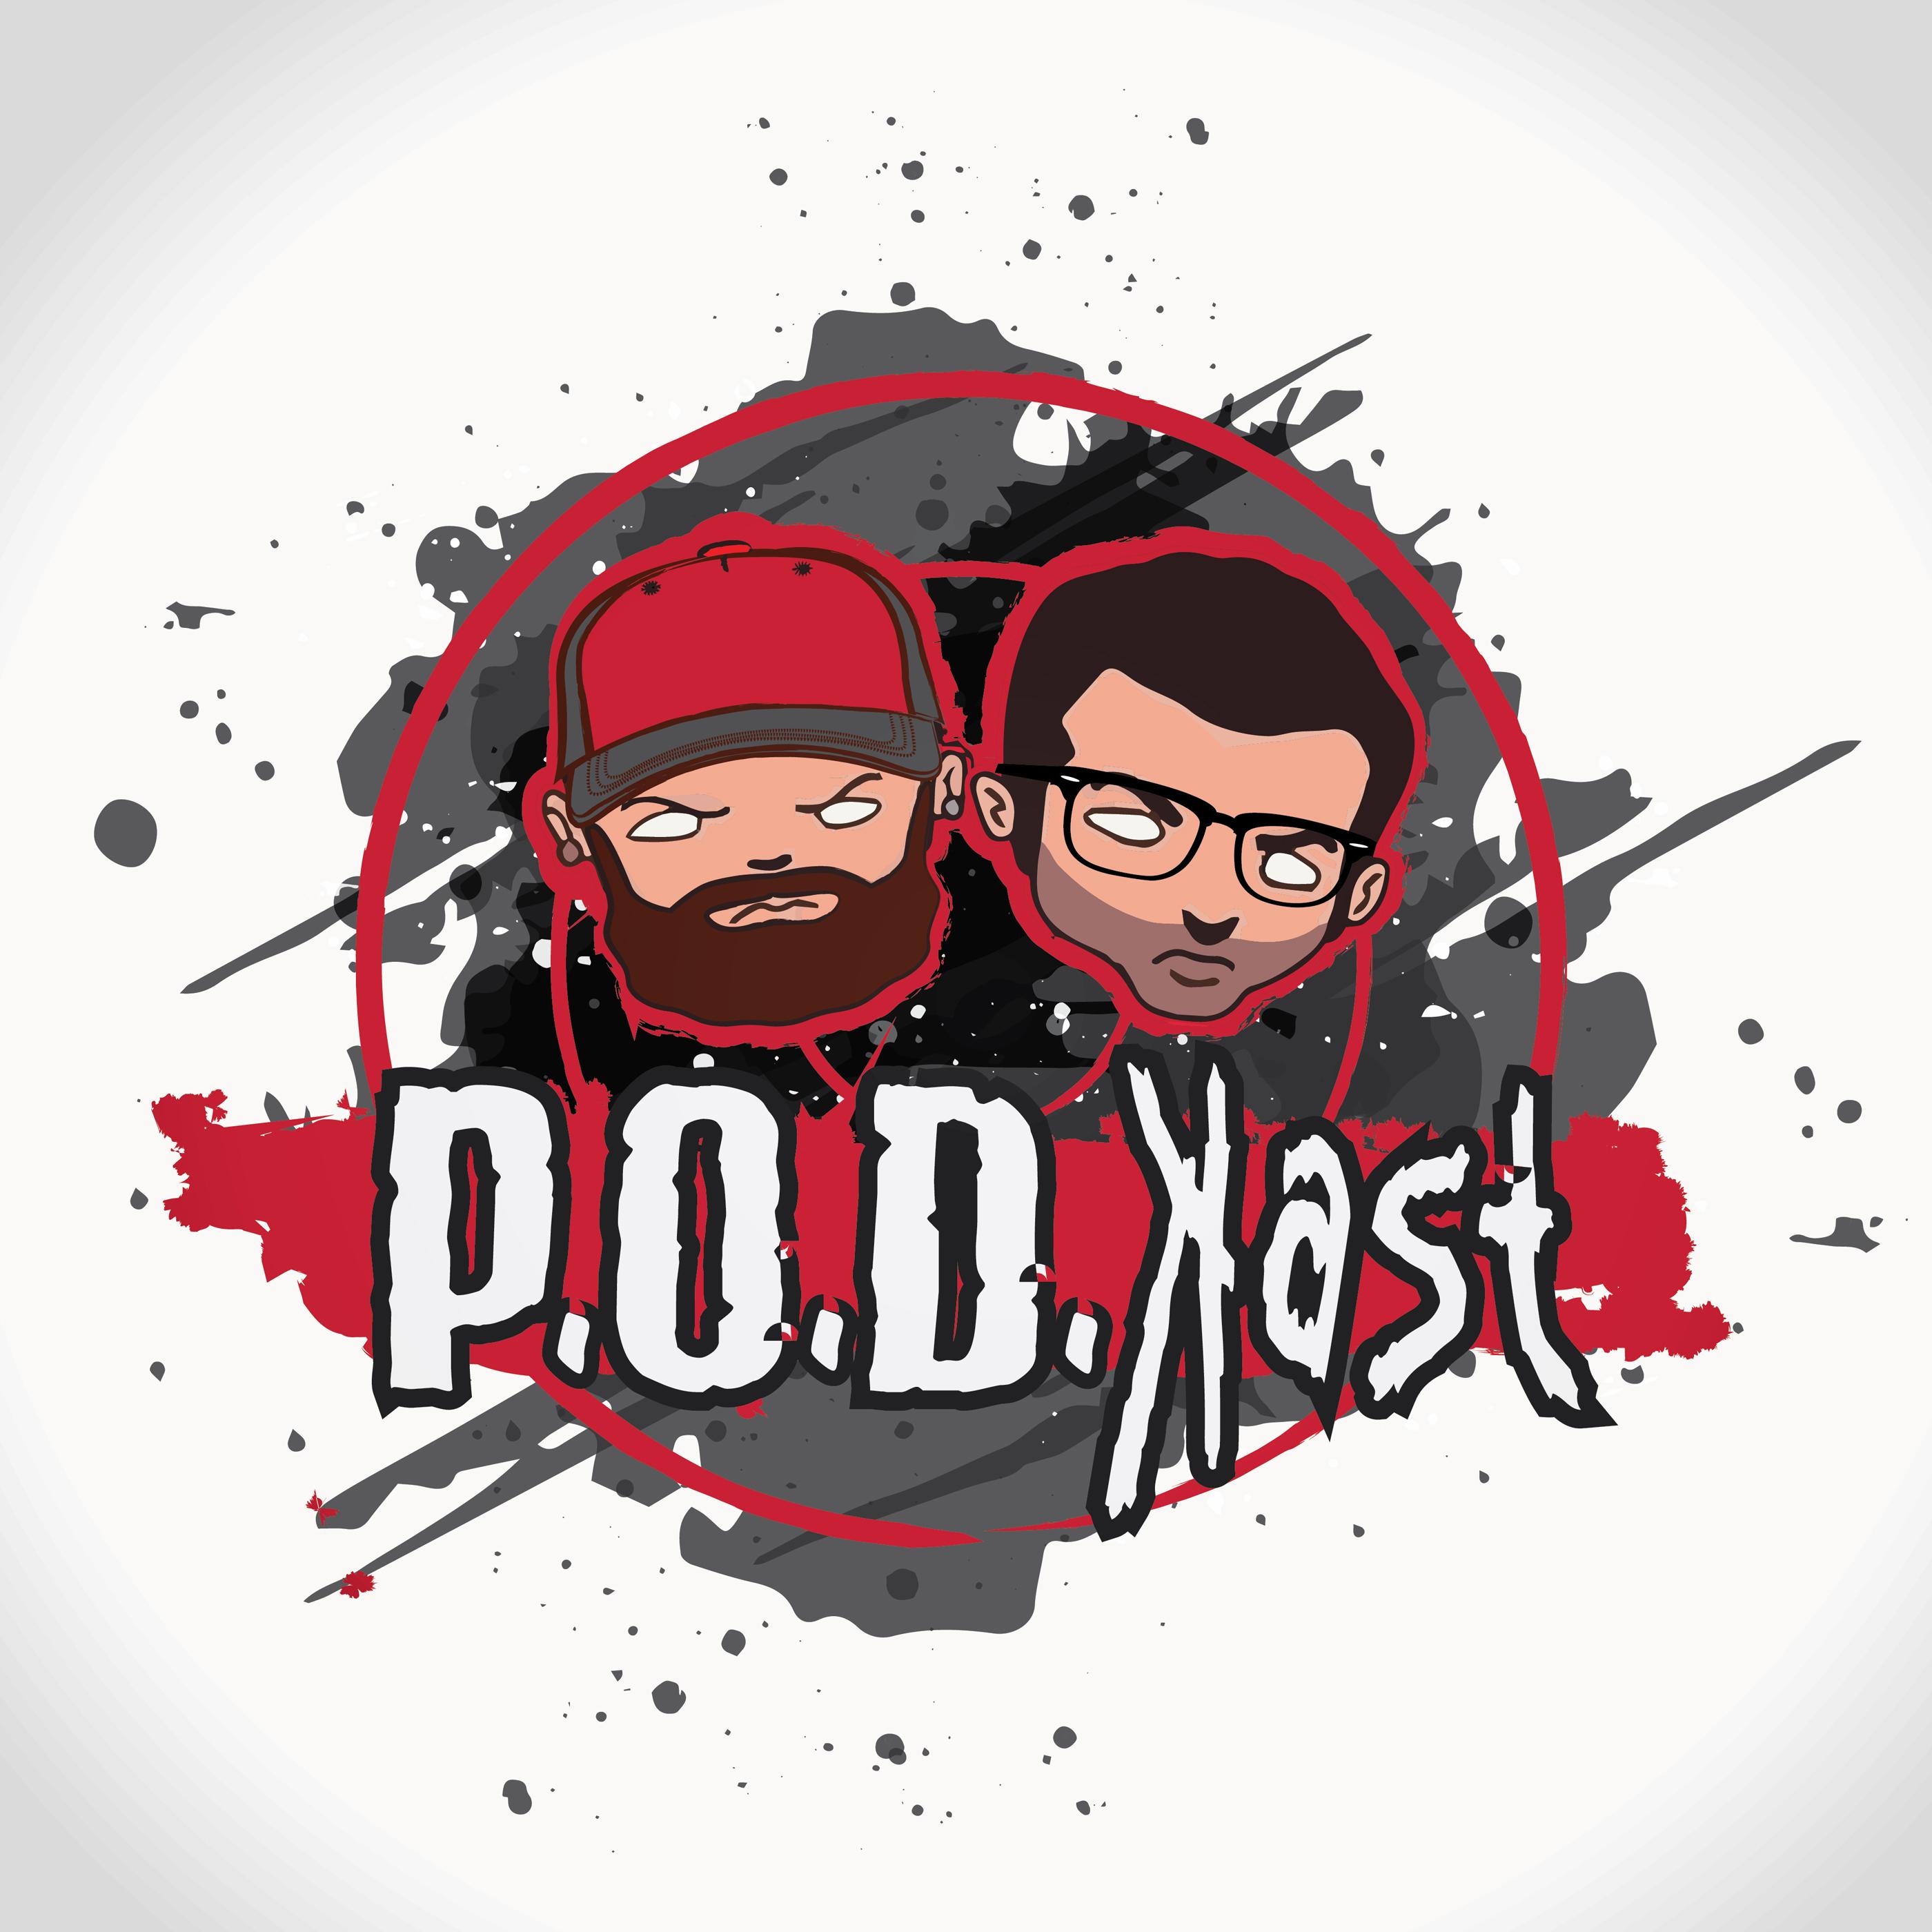 The POD kast podcast cover art